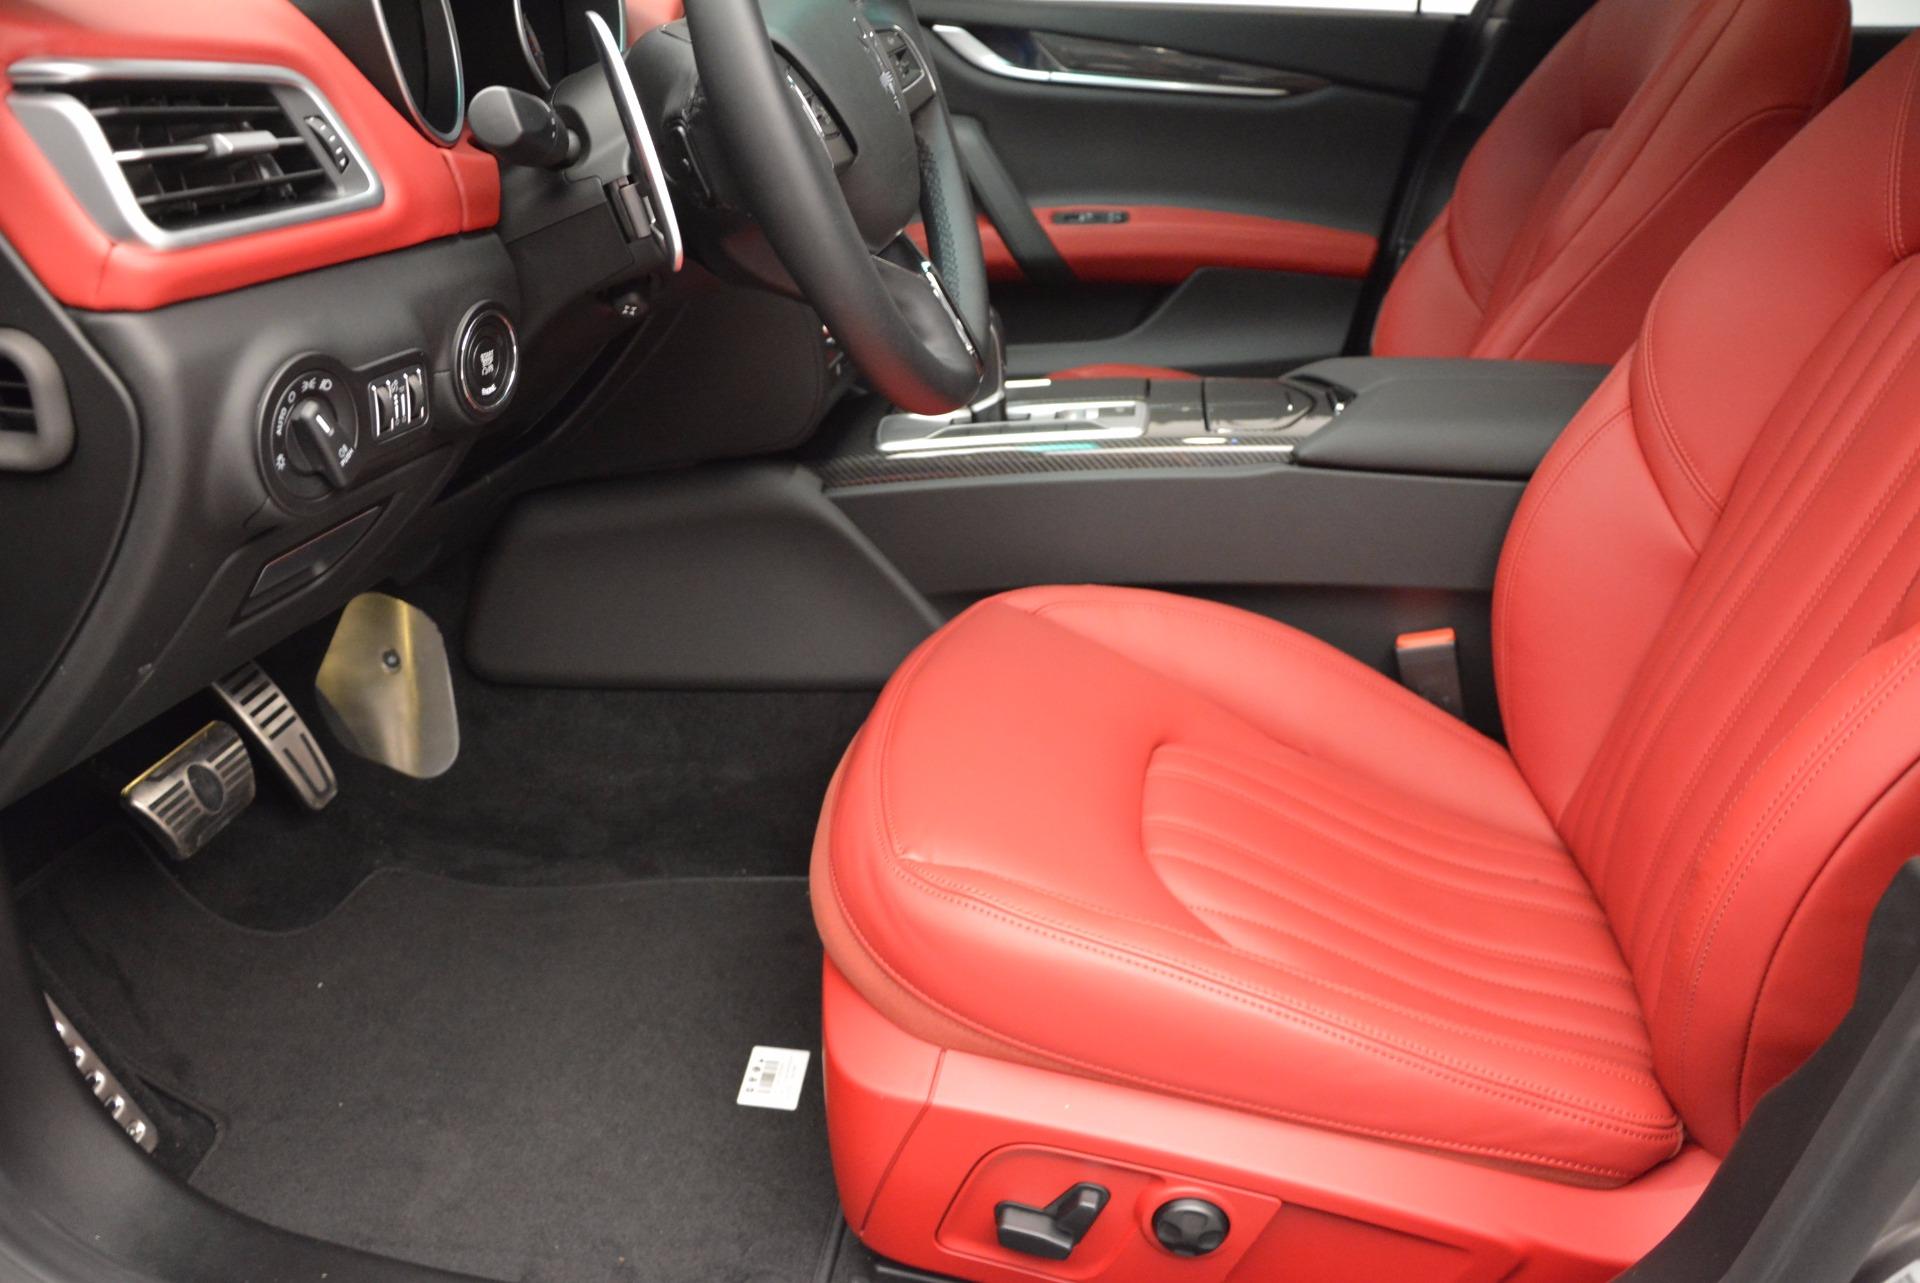 Used 2015 Maserati Ghibli S Q4 For Sale In Westport, CT 1290_p14